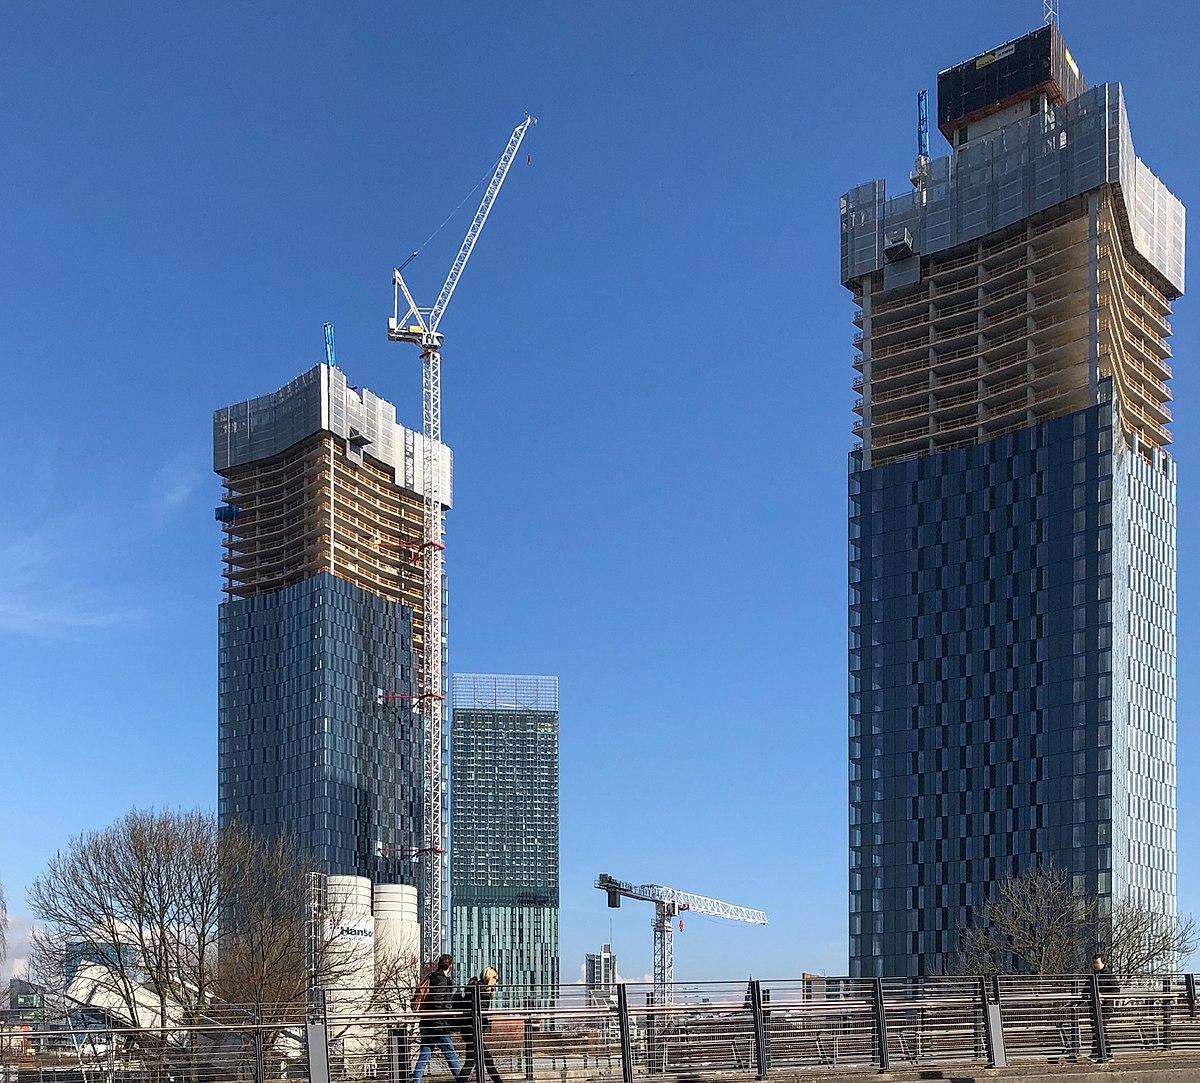 City Gate Apartments: Deansgate Square